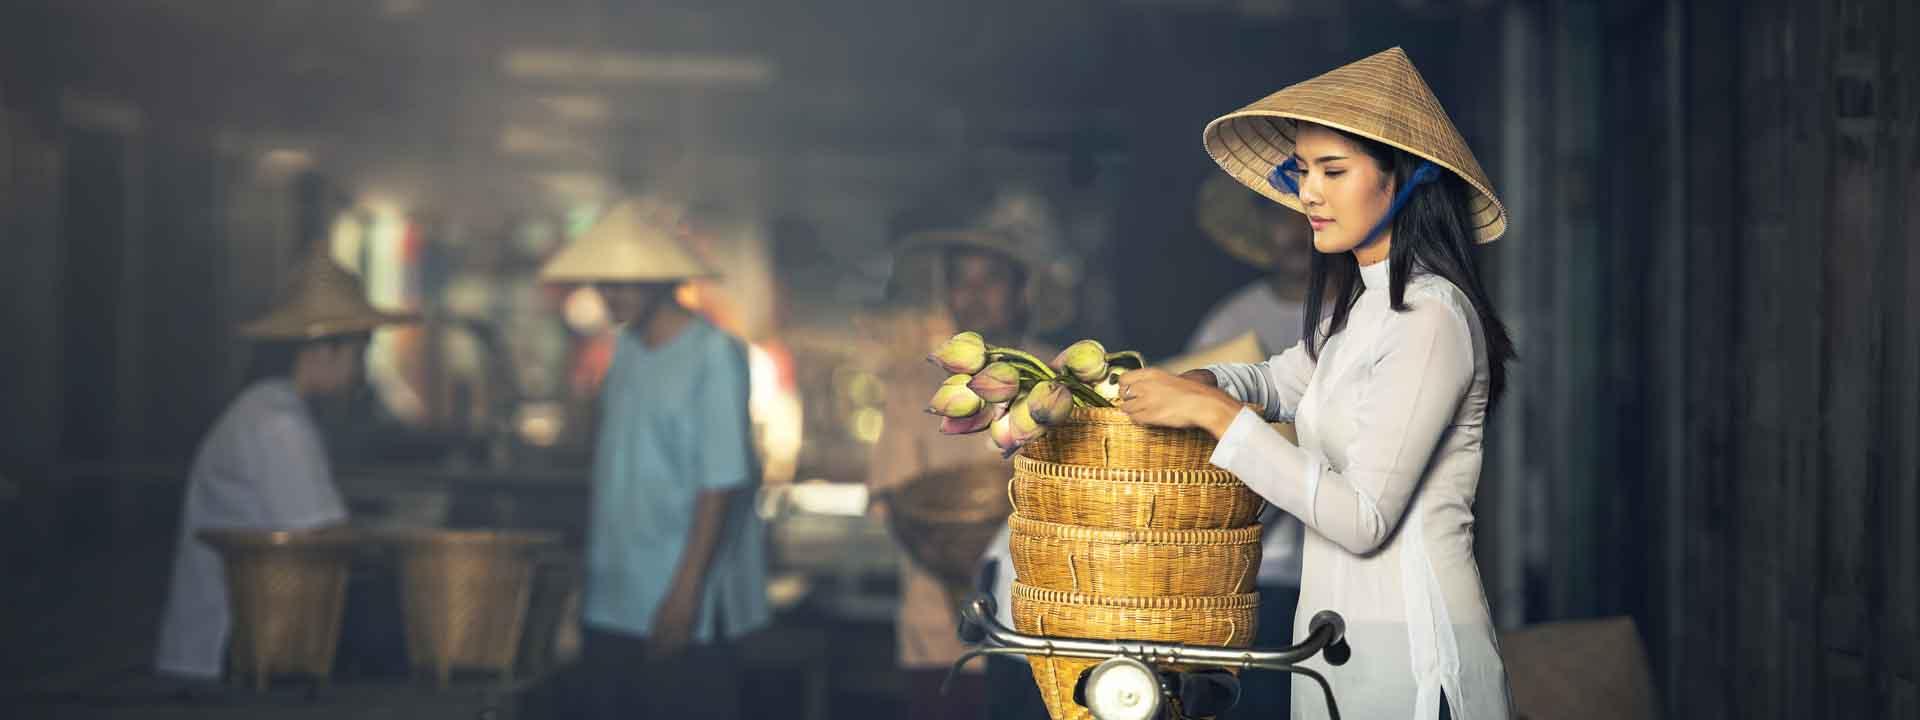 Amazing Hanoi and Ho Chi Minh City Tour 7 days